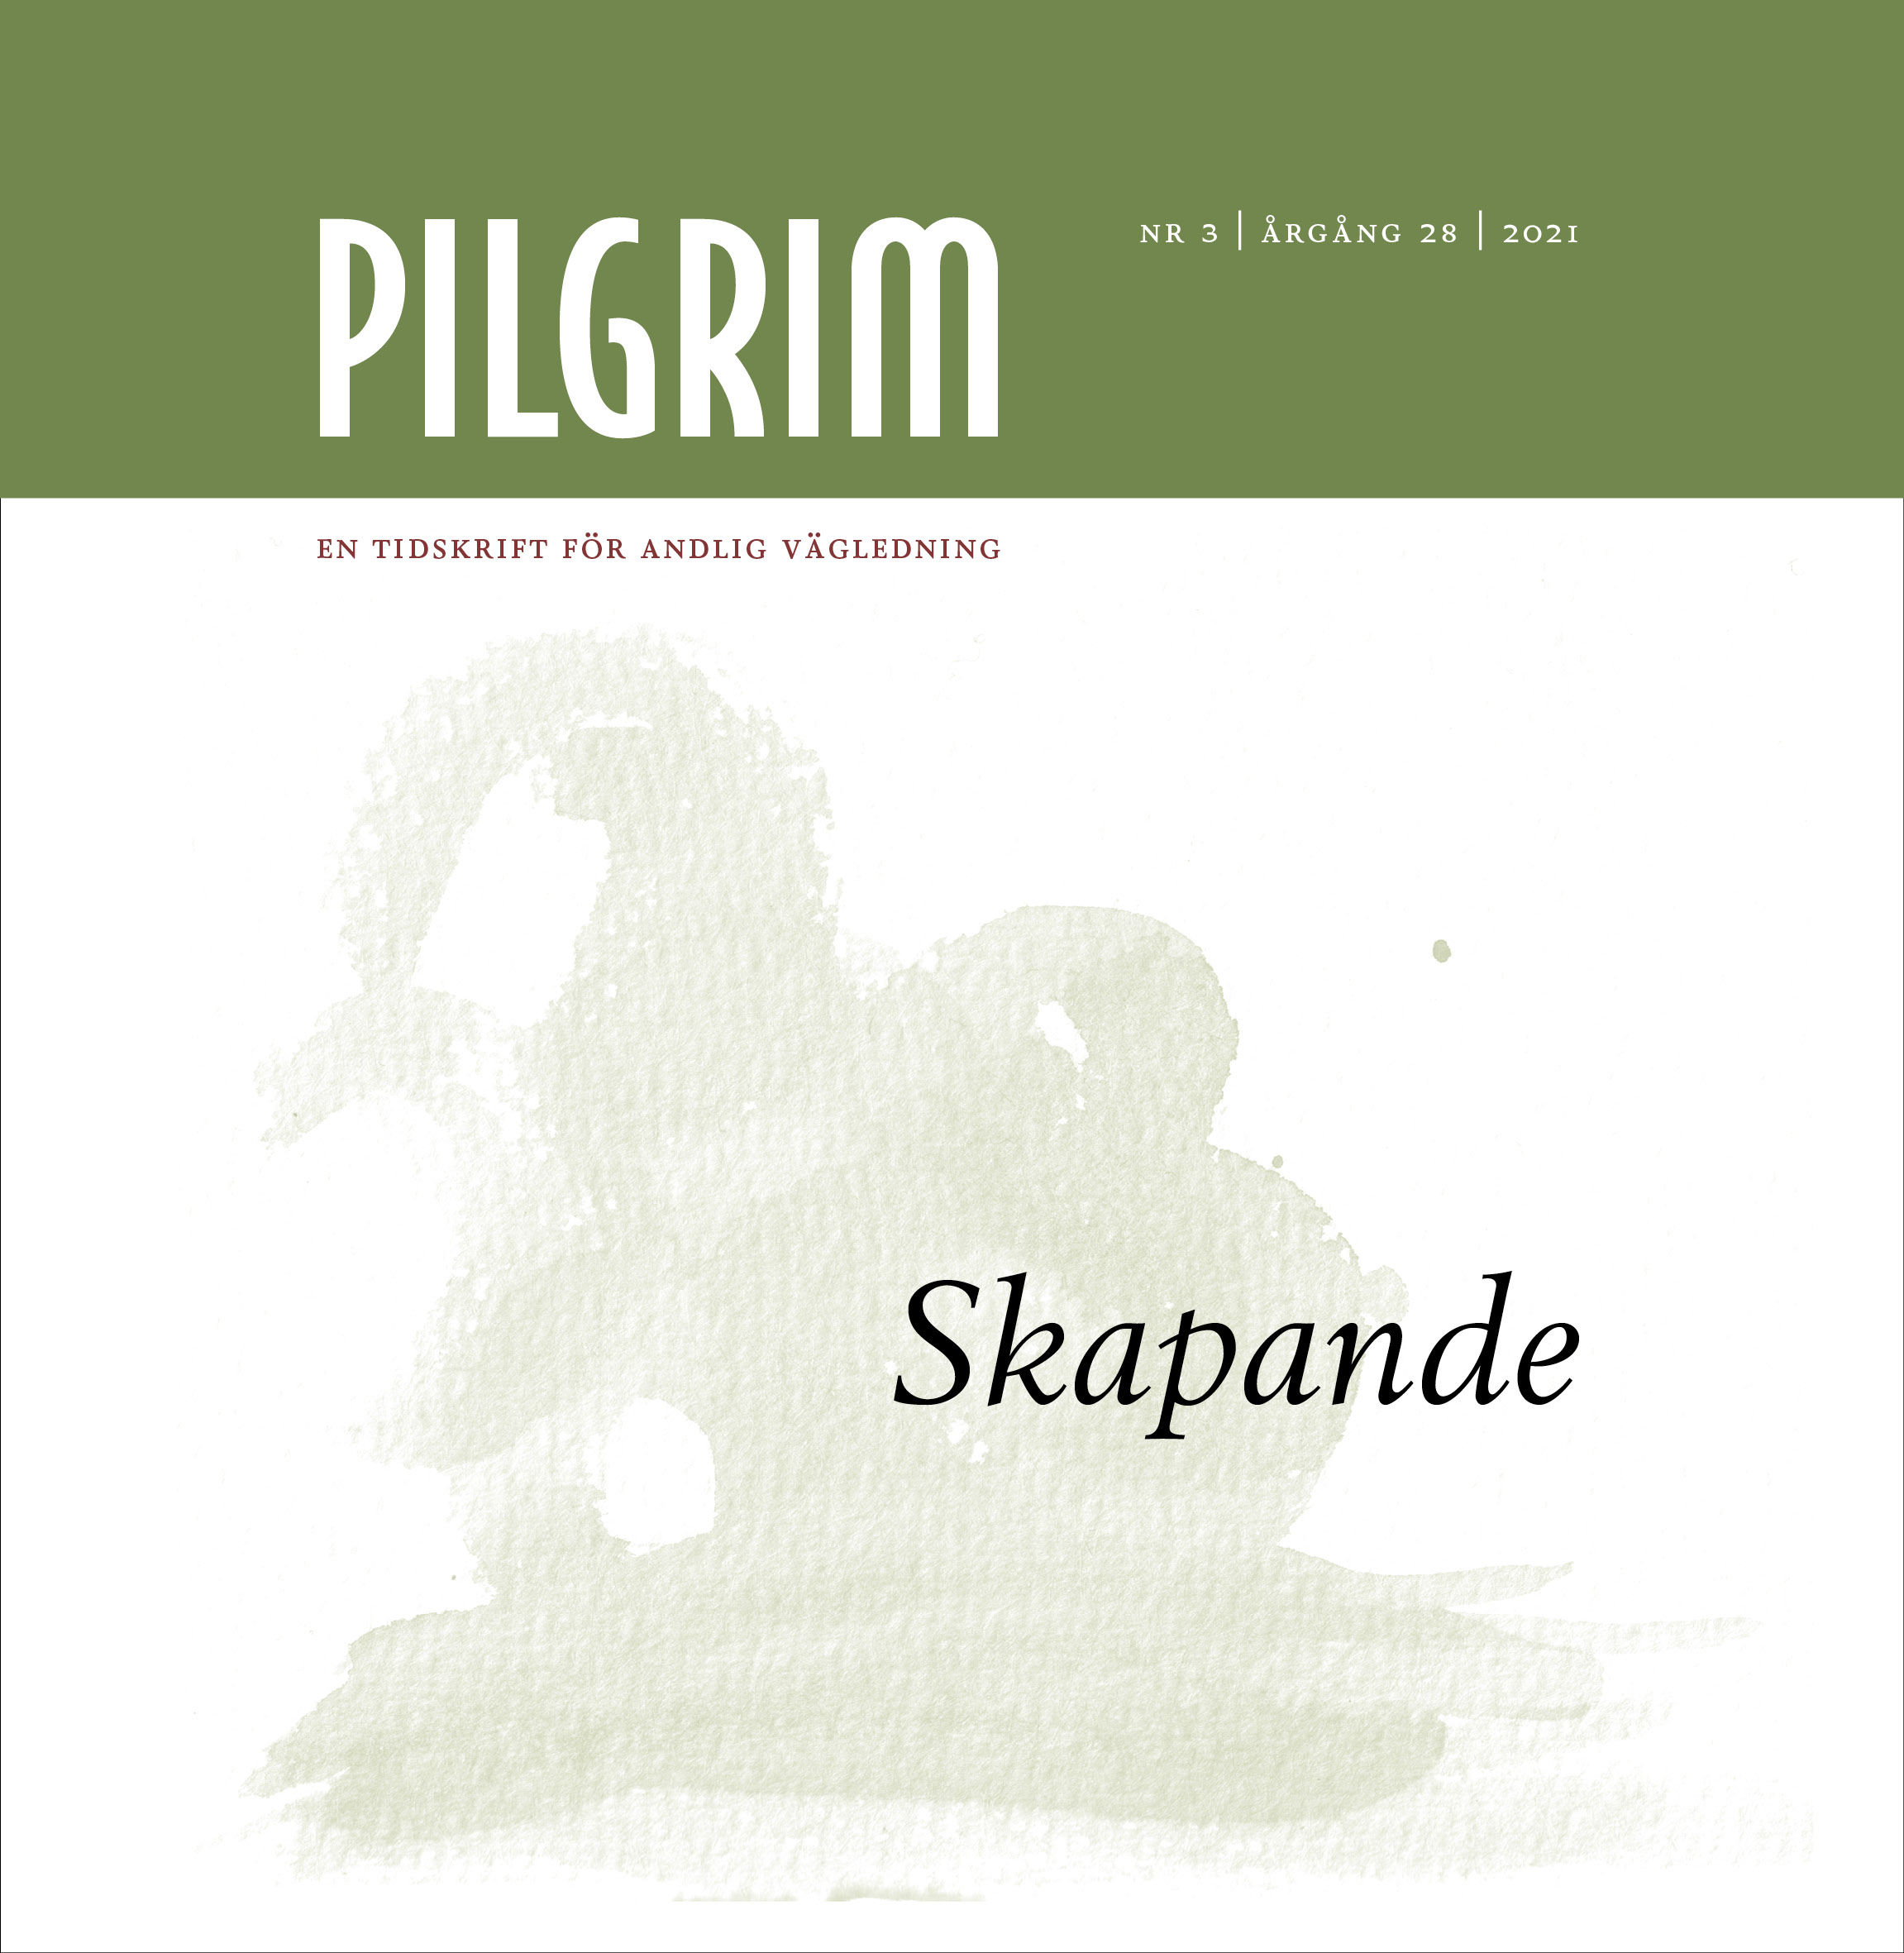 Pilgrim frams 2021-3